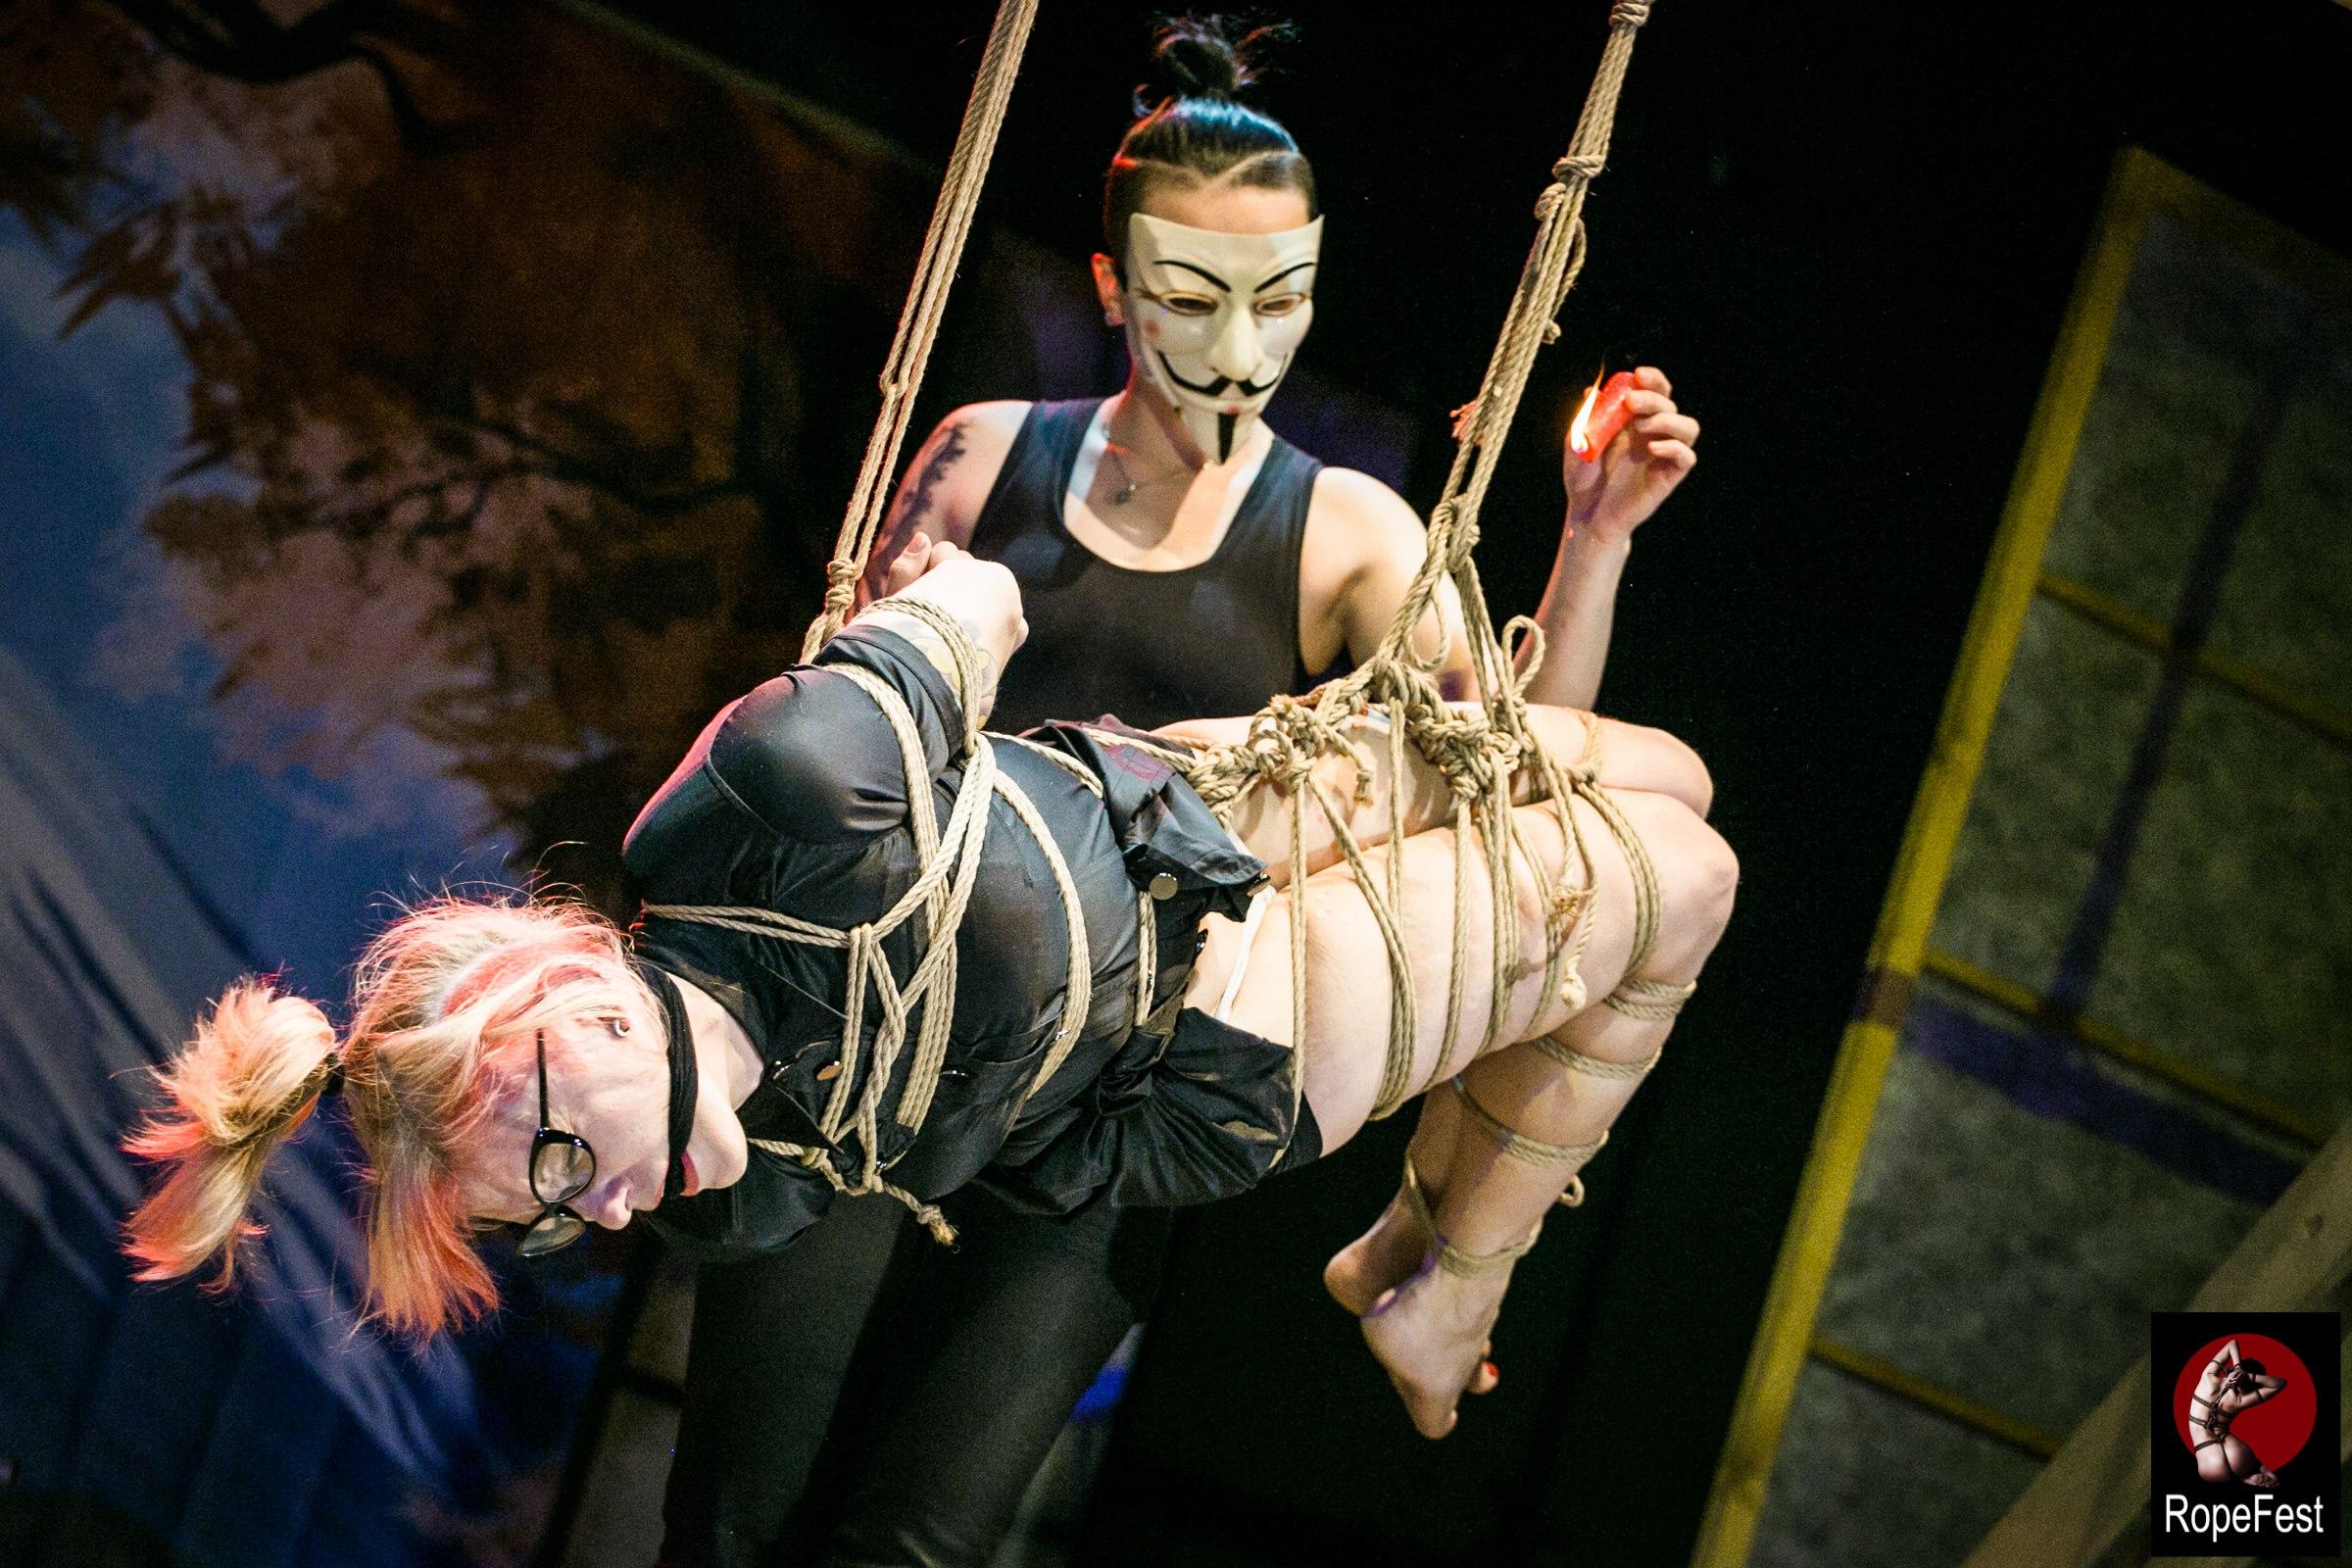 Rope Fest Peterburg . Bondage: Jey Nikk. Photo by Juliya Dunaeva